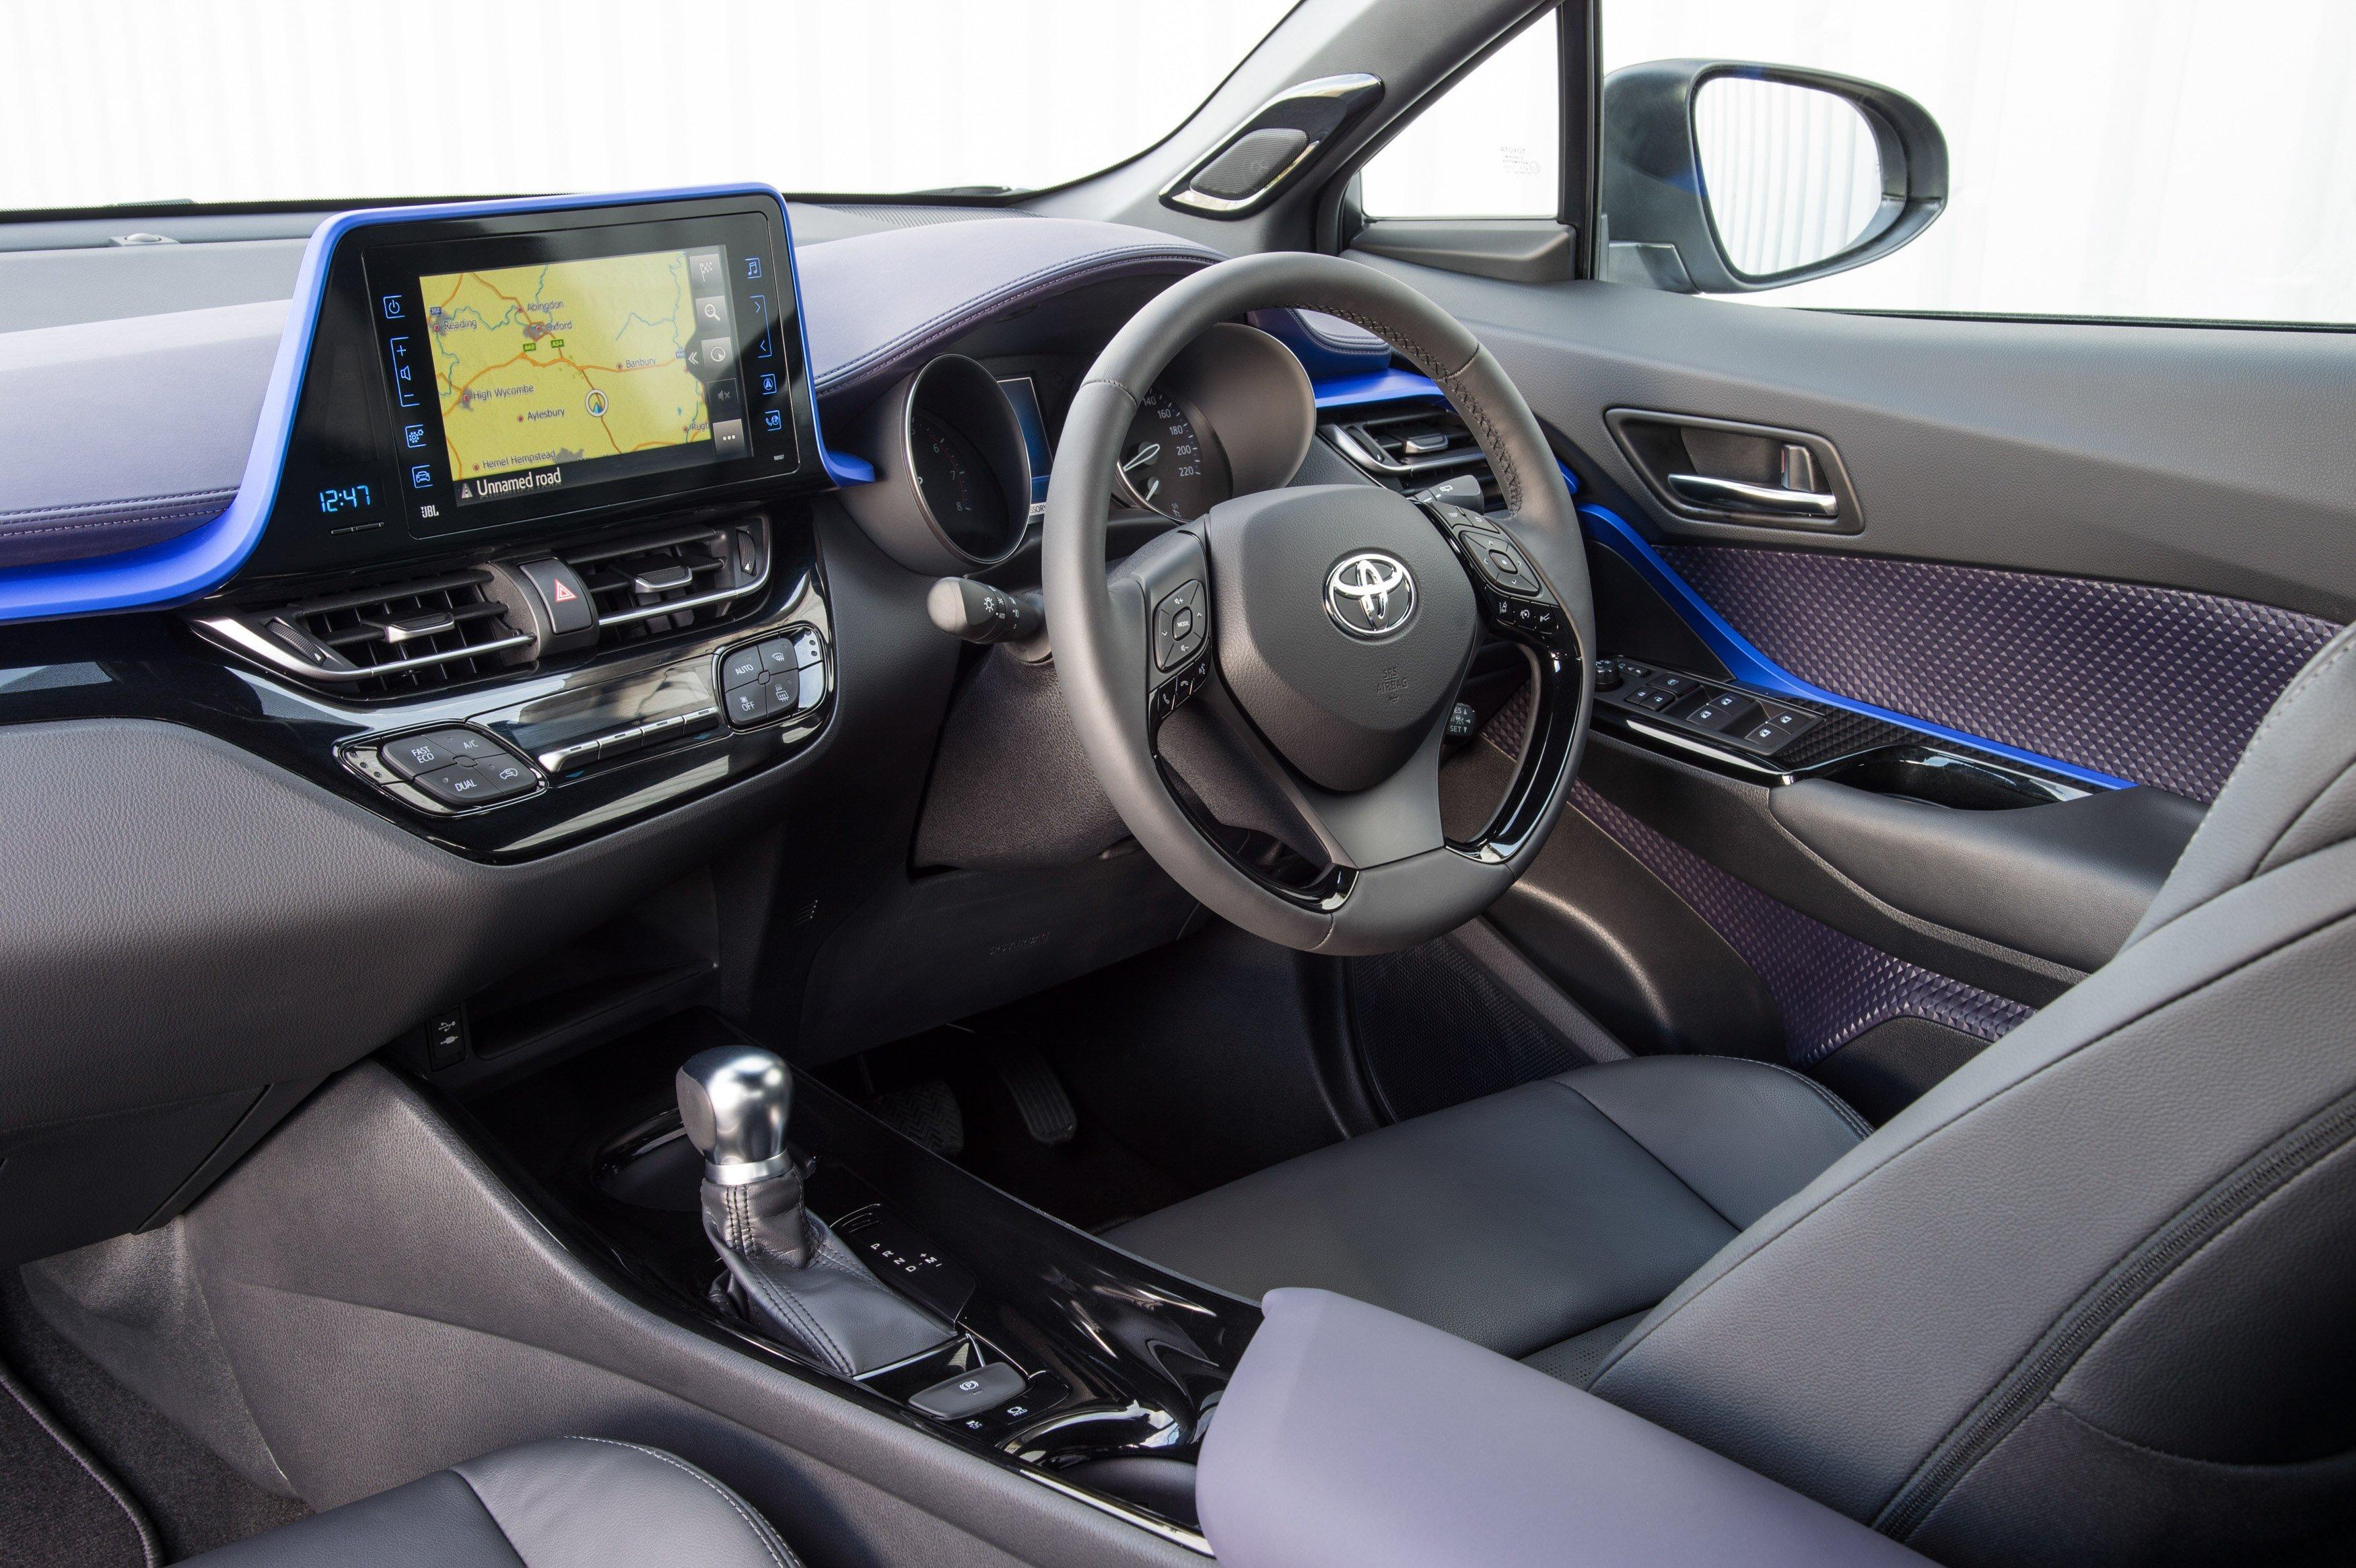 原厂发布更多 Toyota C Hr 实车宣传照,安全配备丰富! 2016 Toyota C Hr Interior